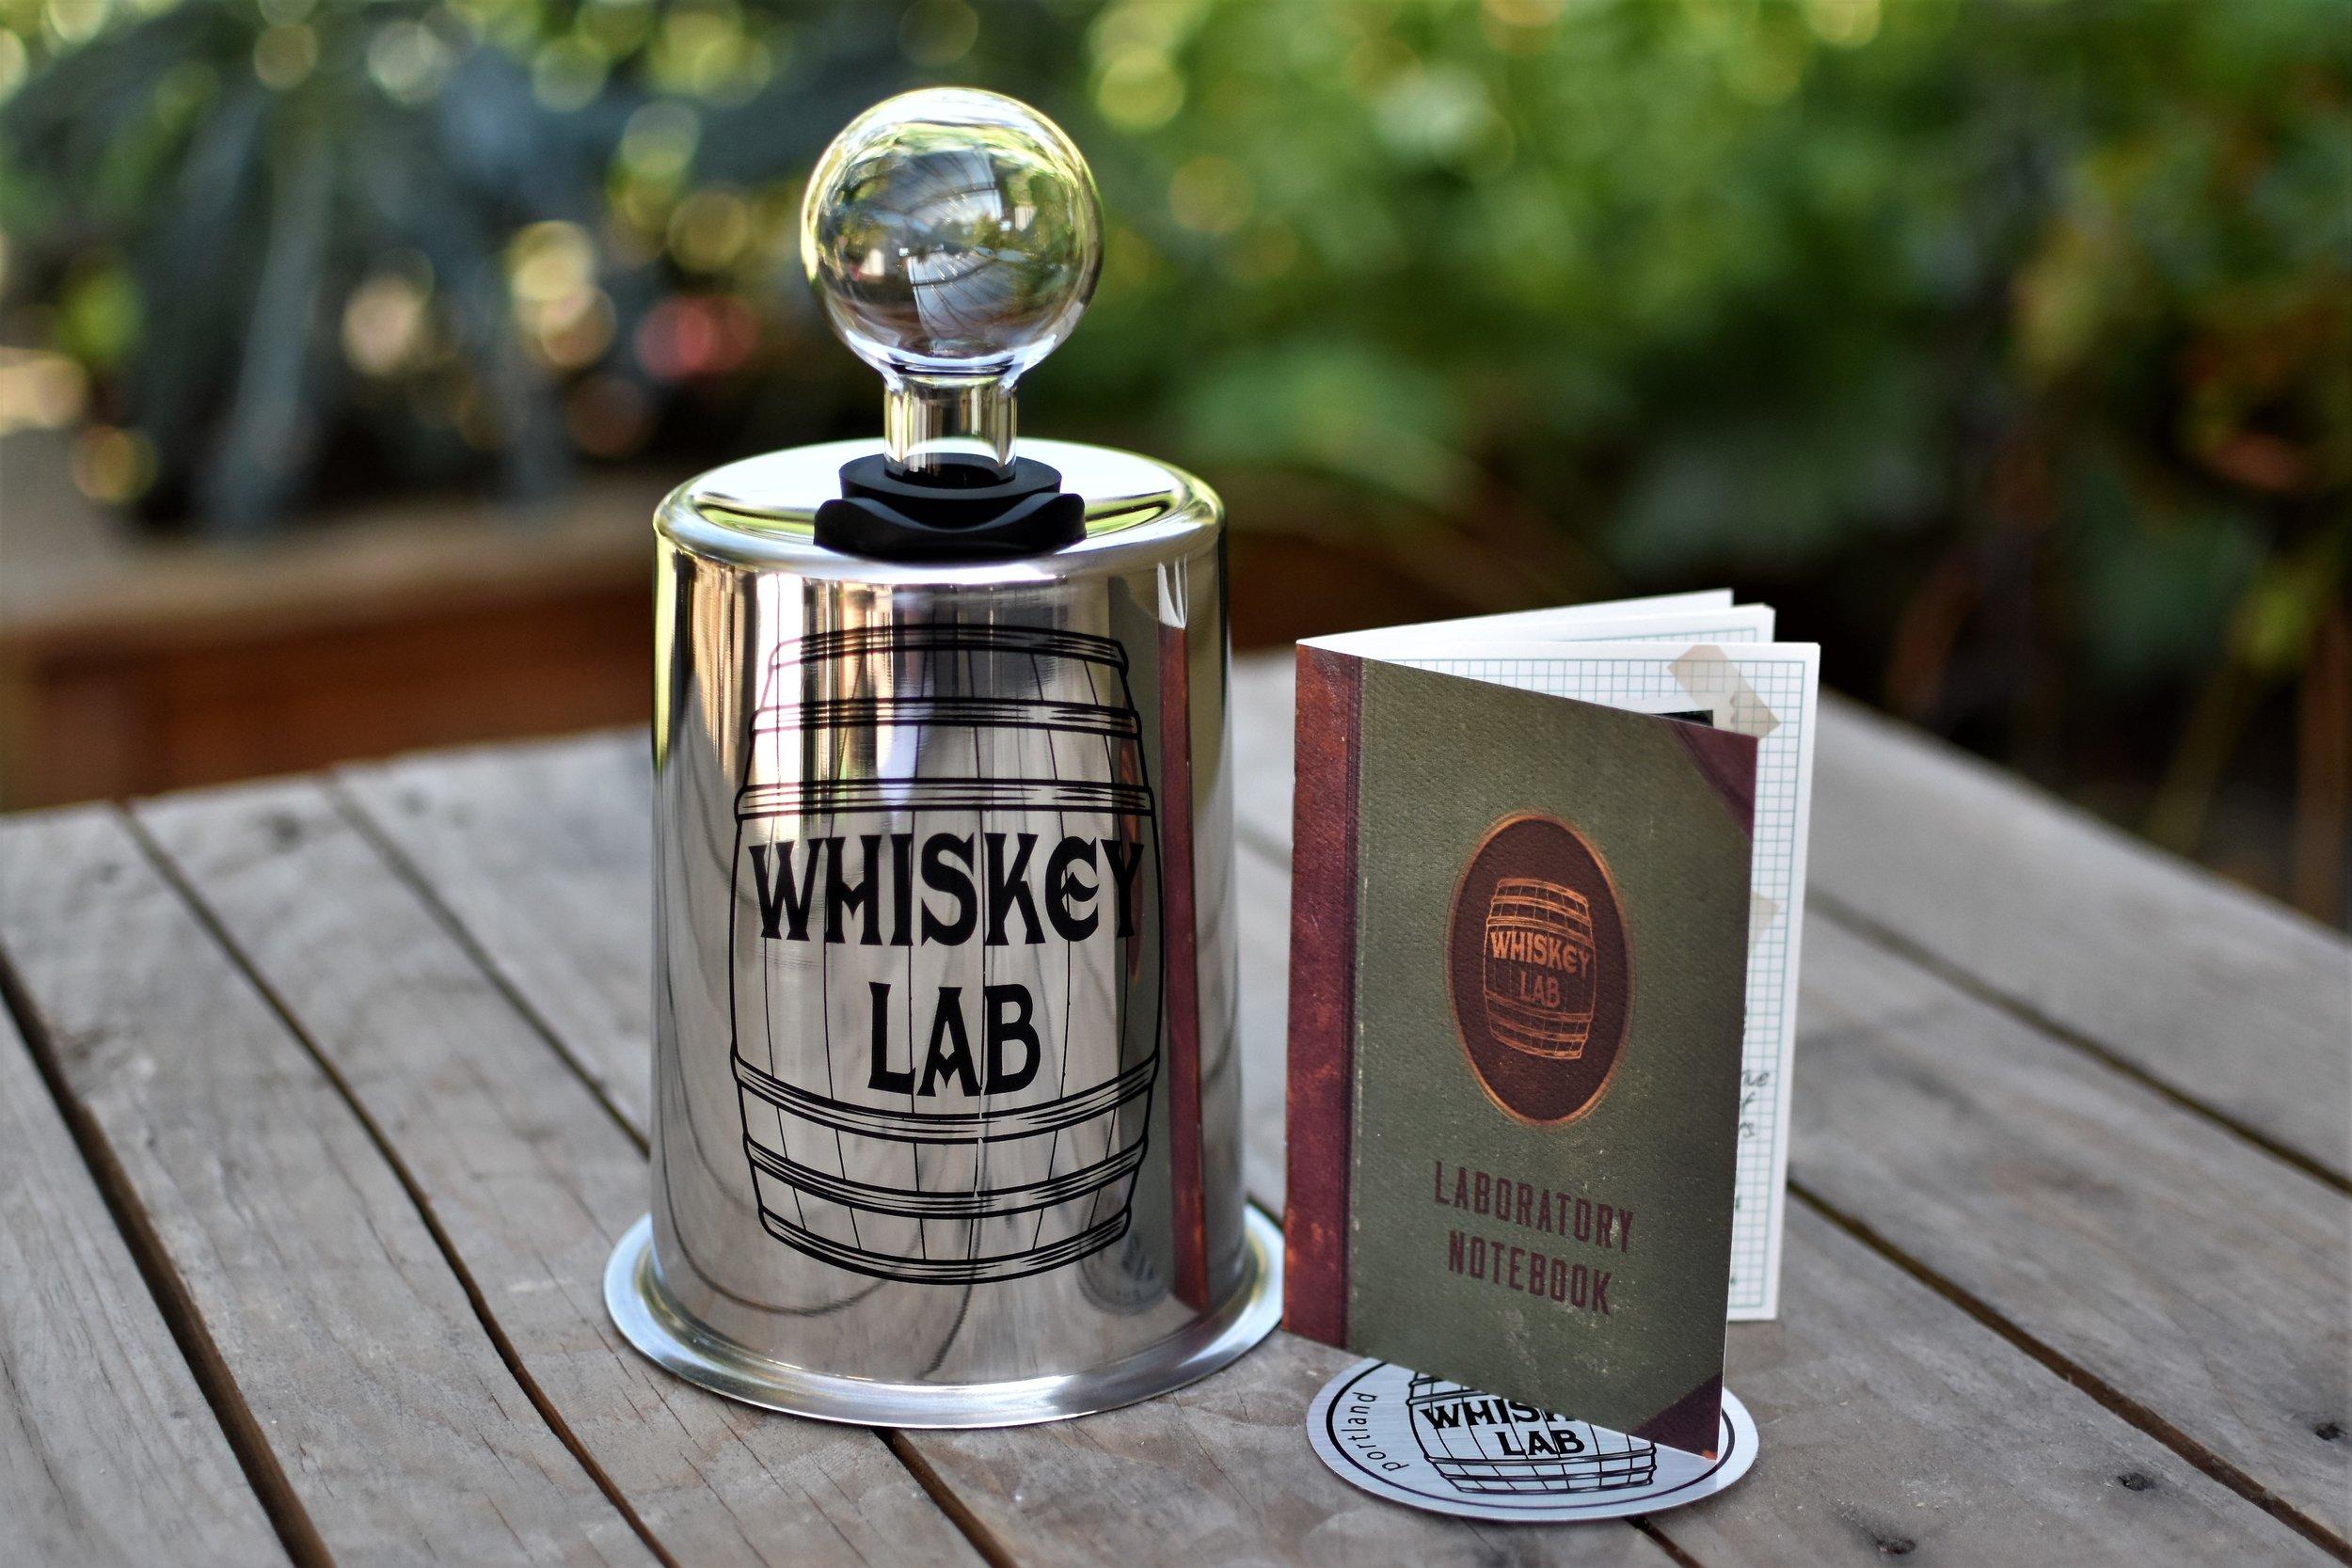 01_Whiskey Lab Front.jpg